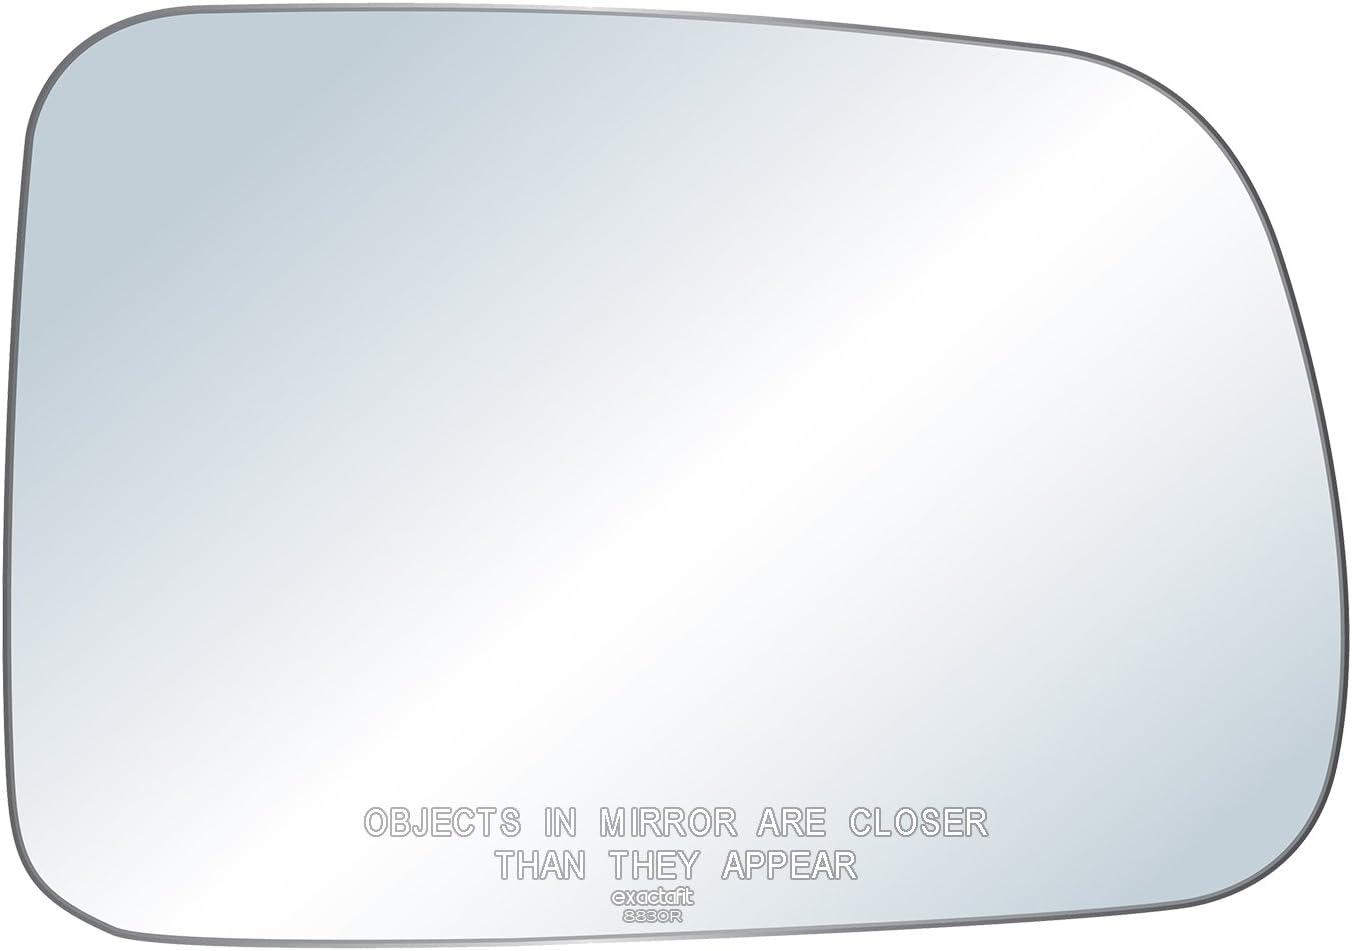 exactafit 8830R Right Passenger Side Mirror Replacement Glass Fits 1997-2006 Honda CR-V CRV